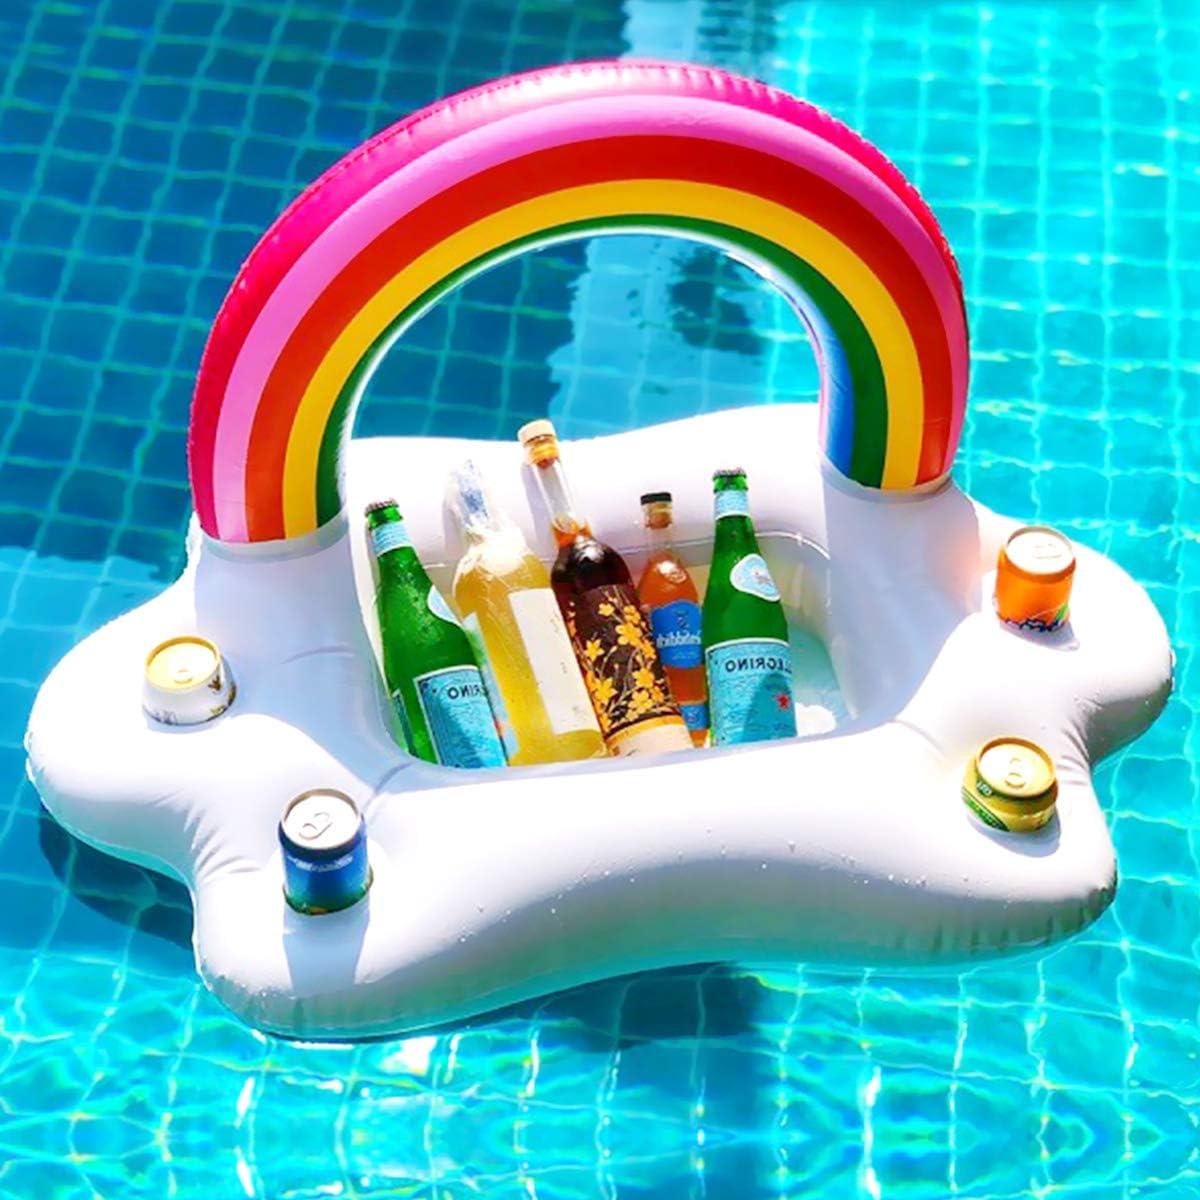 BestFire Inflatable Drink Holder Floating Rainbow Cloud Pool Drink Holder Floats Beverage Salad Fruit Serving Bar Pool Float Party Accessories Summer Beach Leisure Cup Bottle Holder Toys Kids Adults